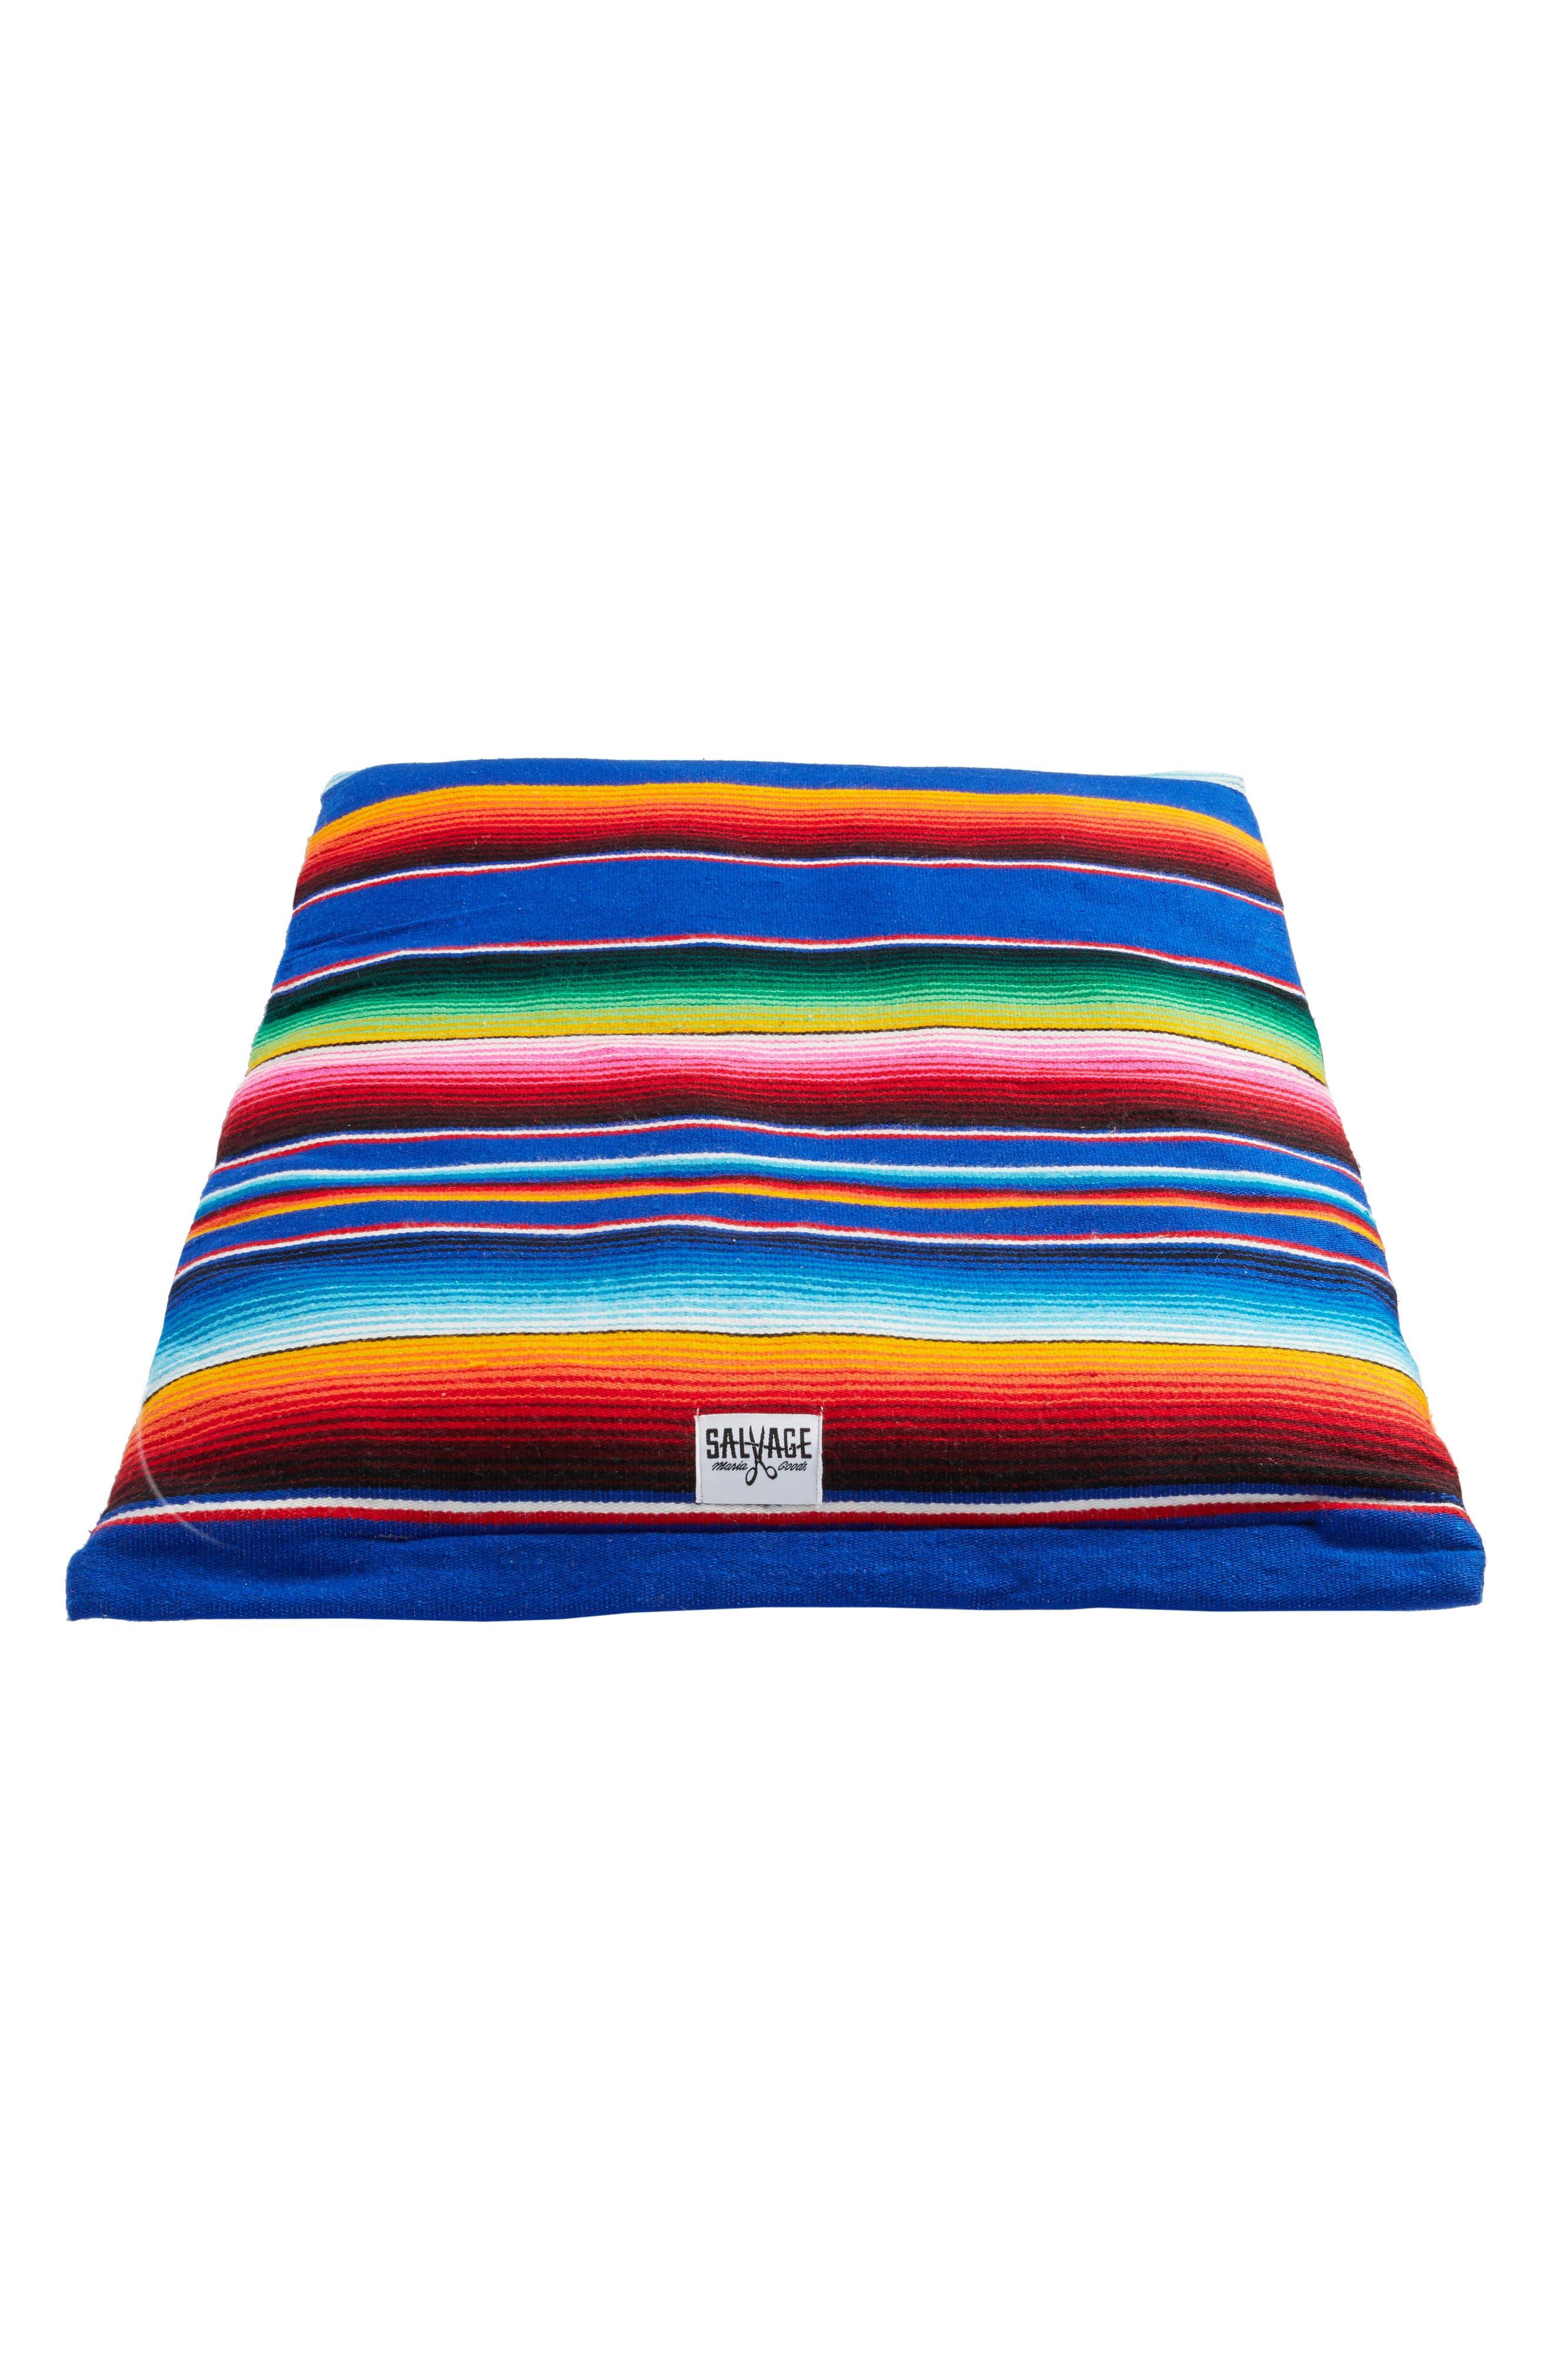 Saltillo Serape Roll-Up Dog Bed,                         Main,                         color,